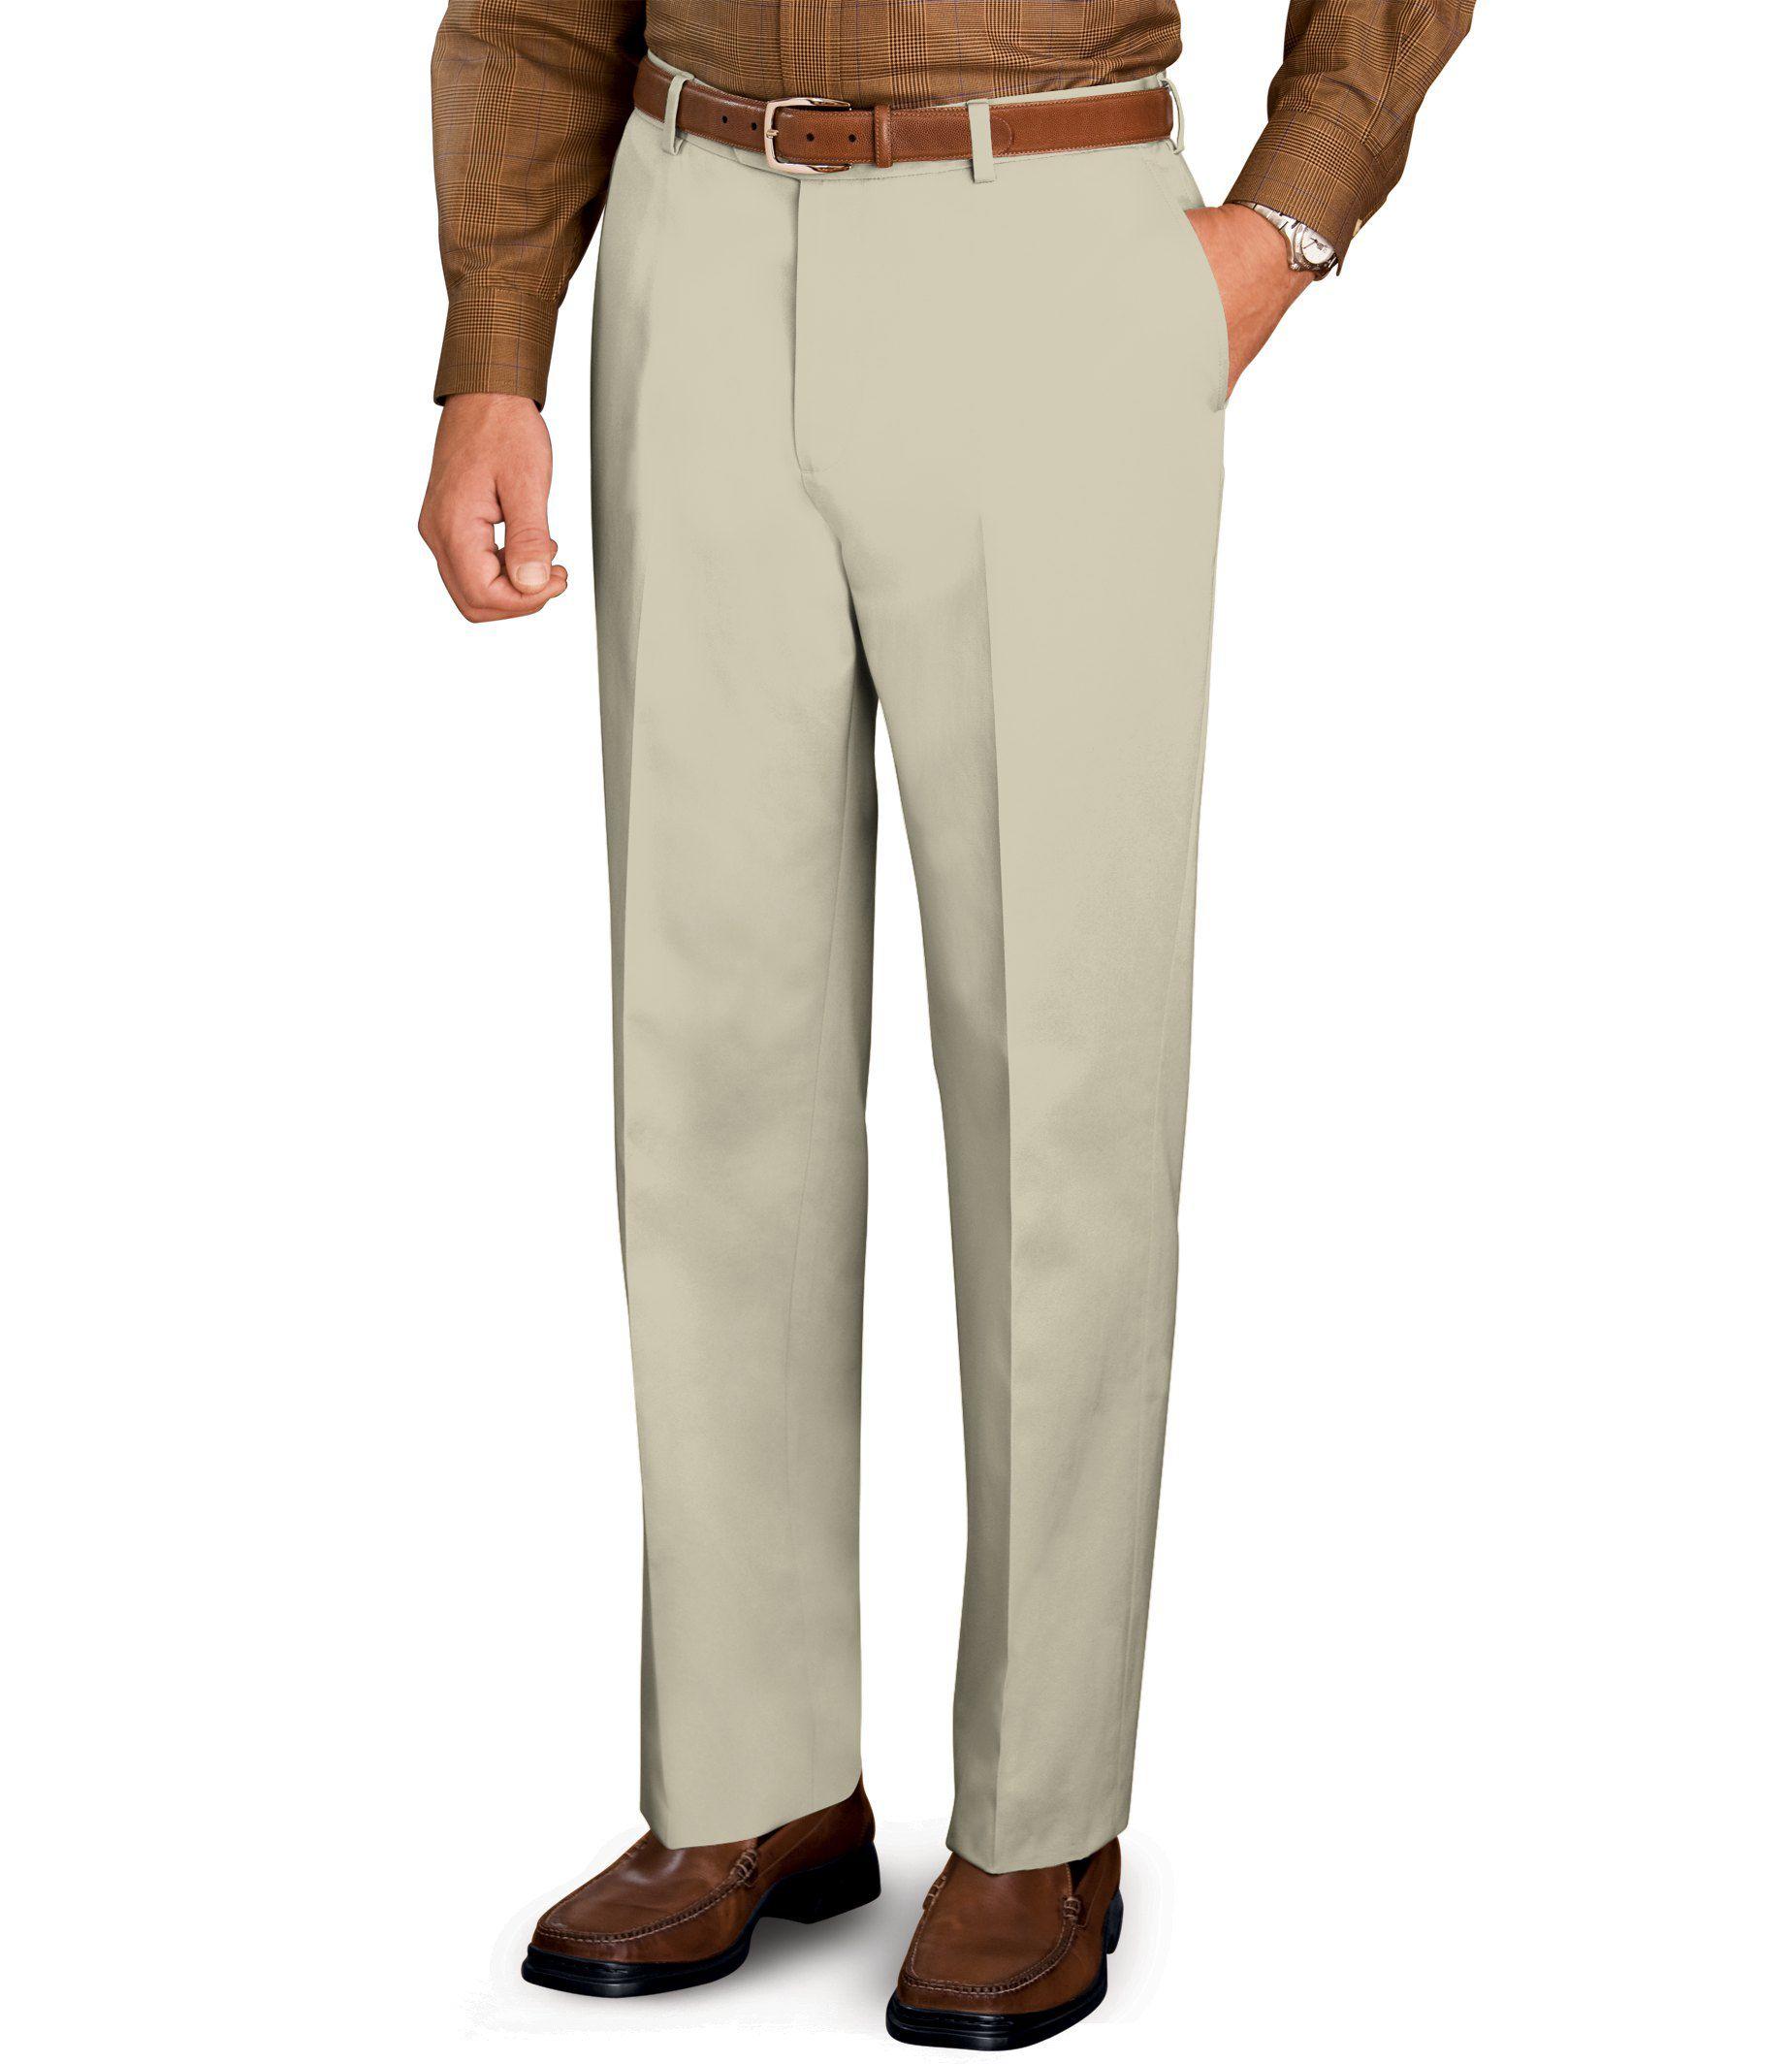 Traveler Slim Fit Twill Plain Front Pant